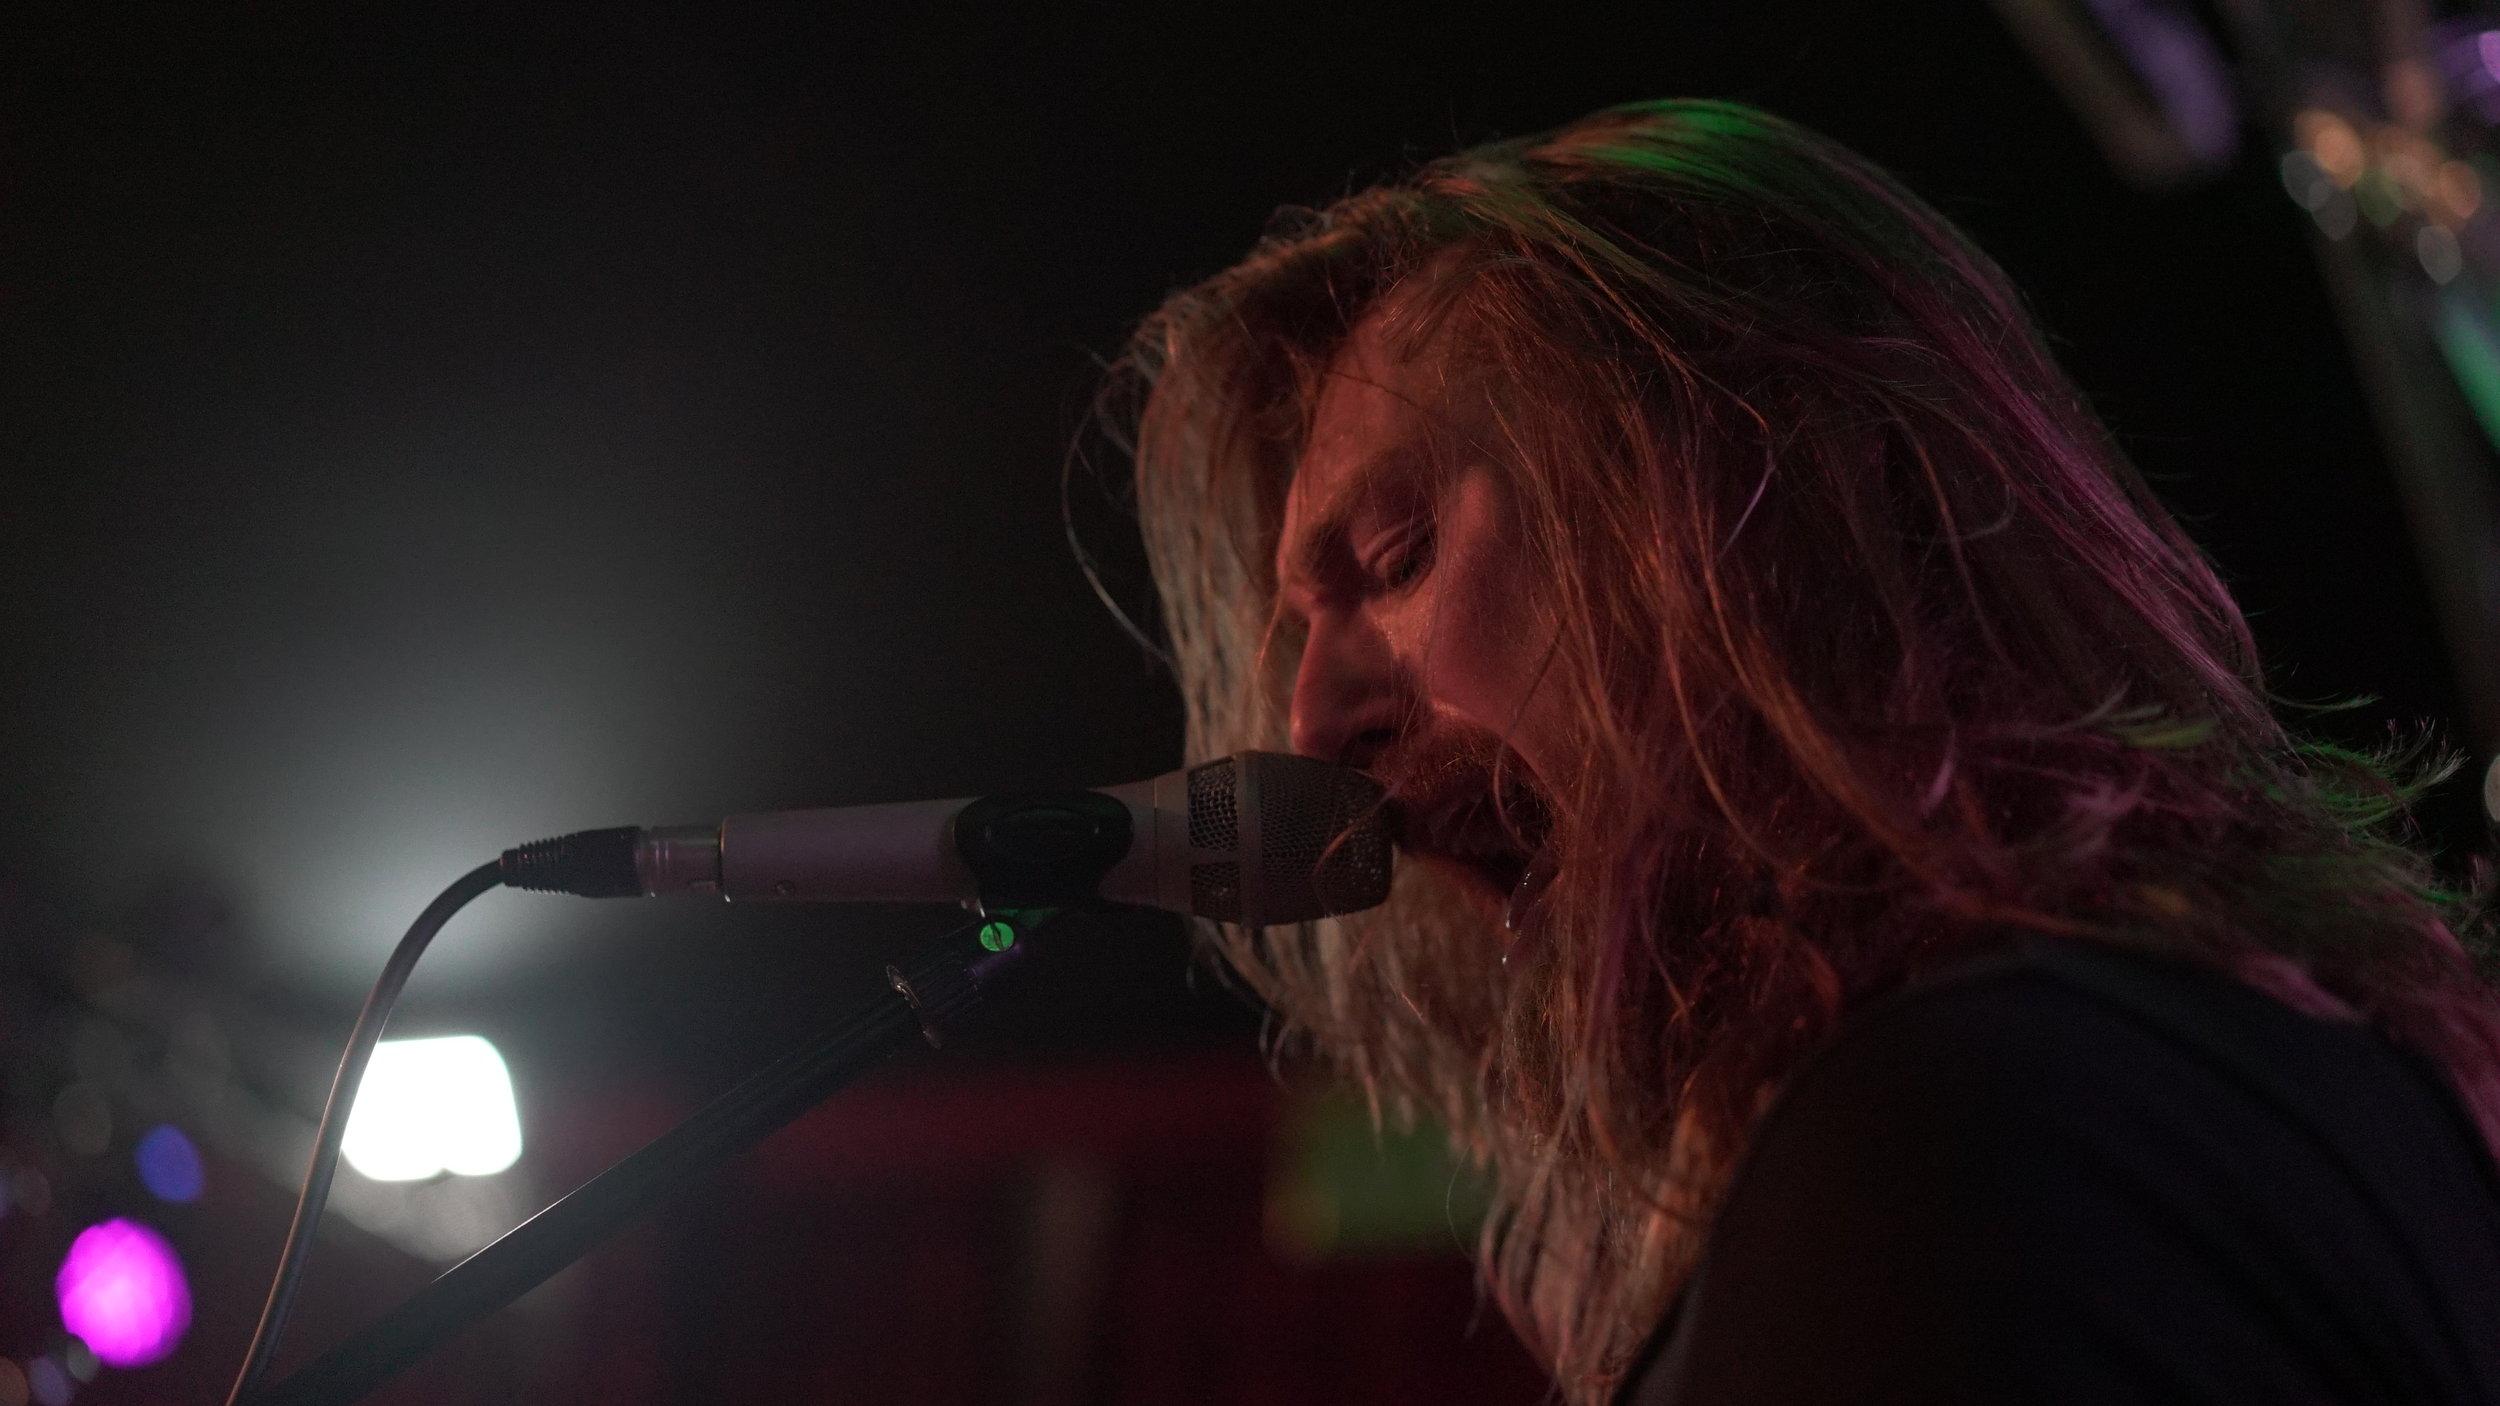 JOE BLANKS - Vocals/Guitar